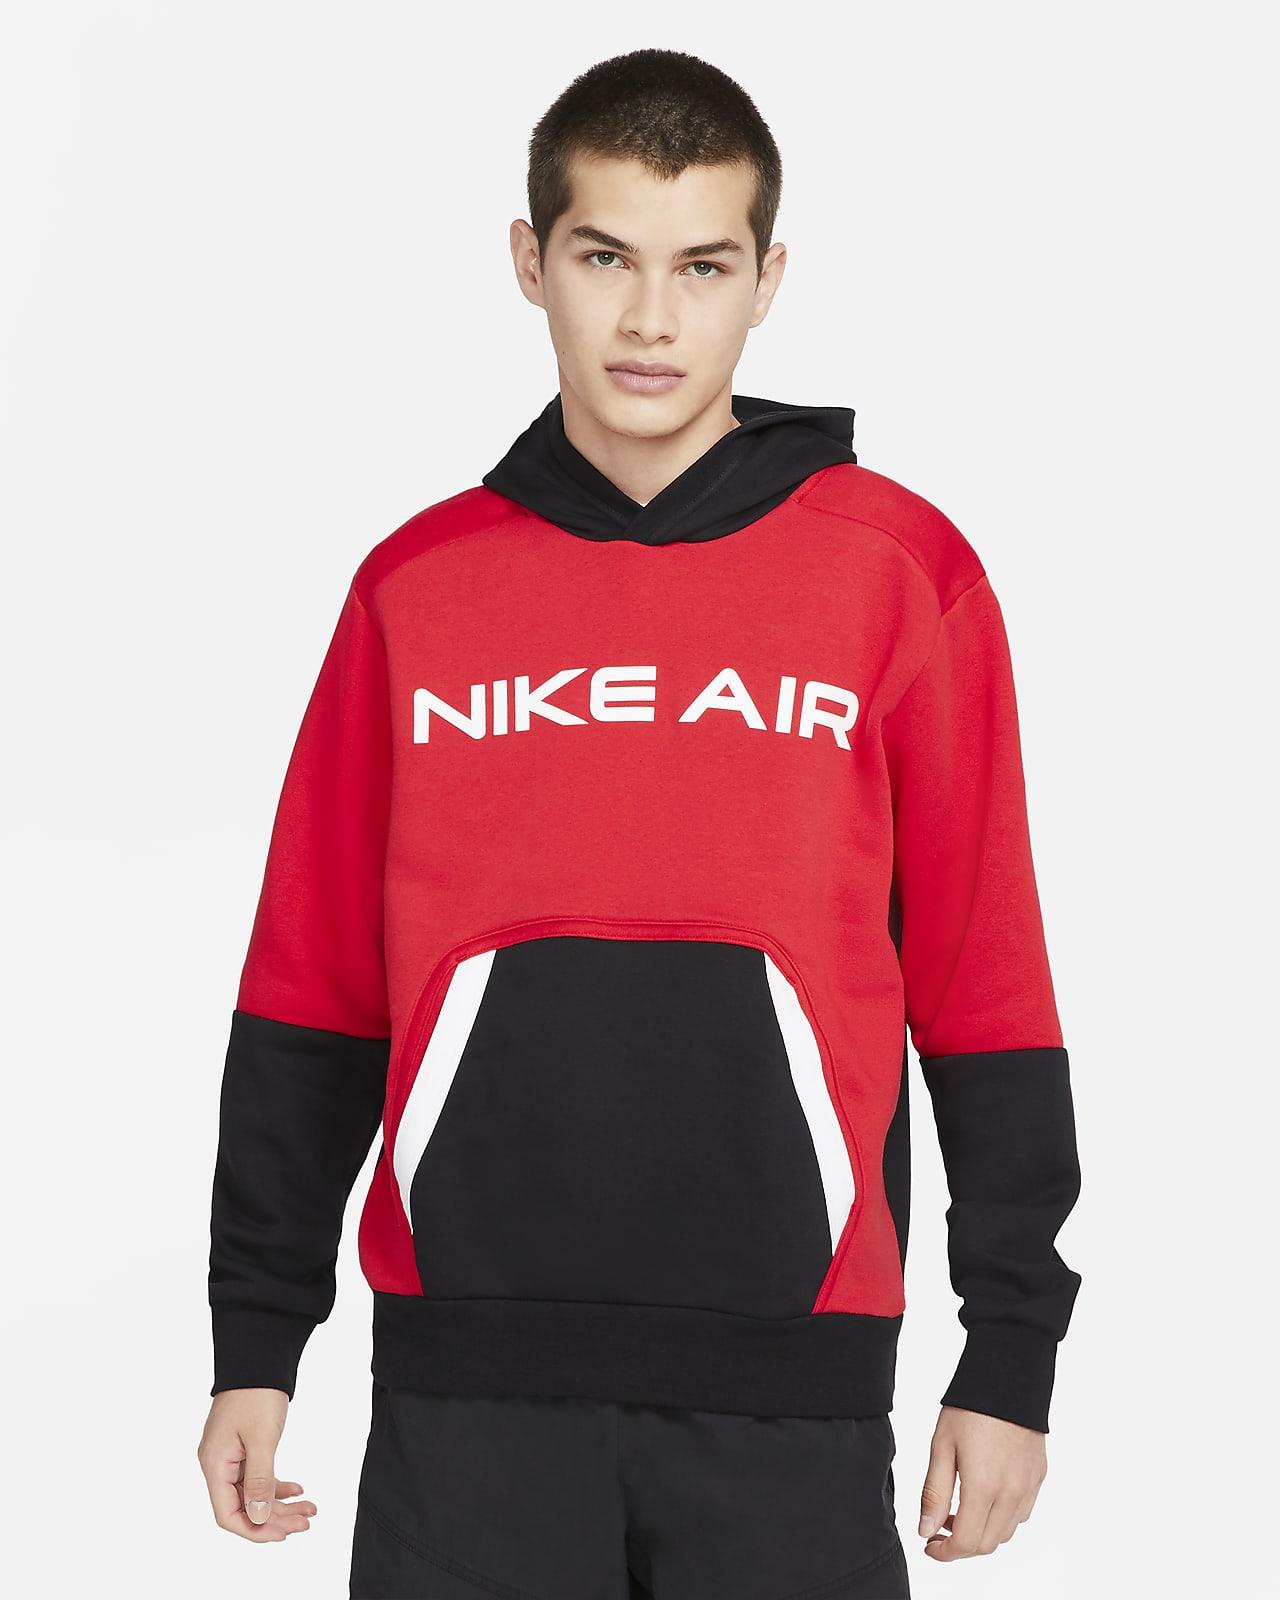 Nike Air Pullover Fleece Herren-Hoodie